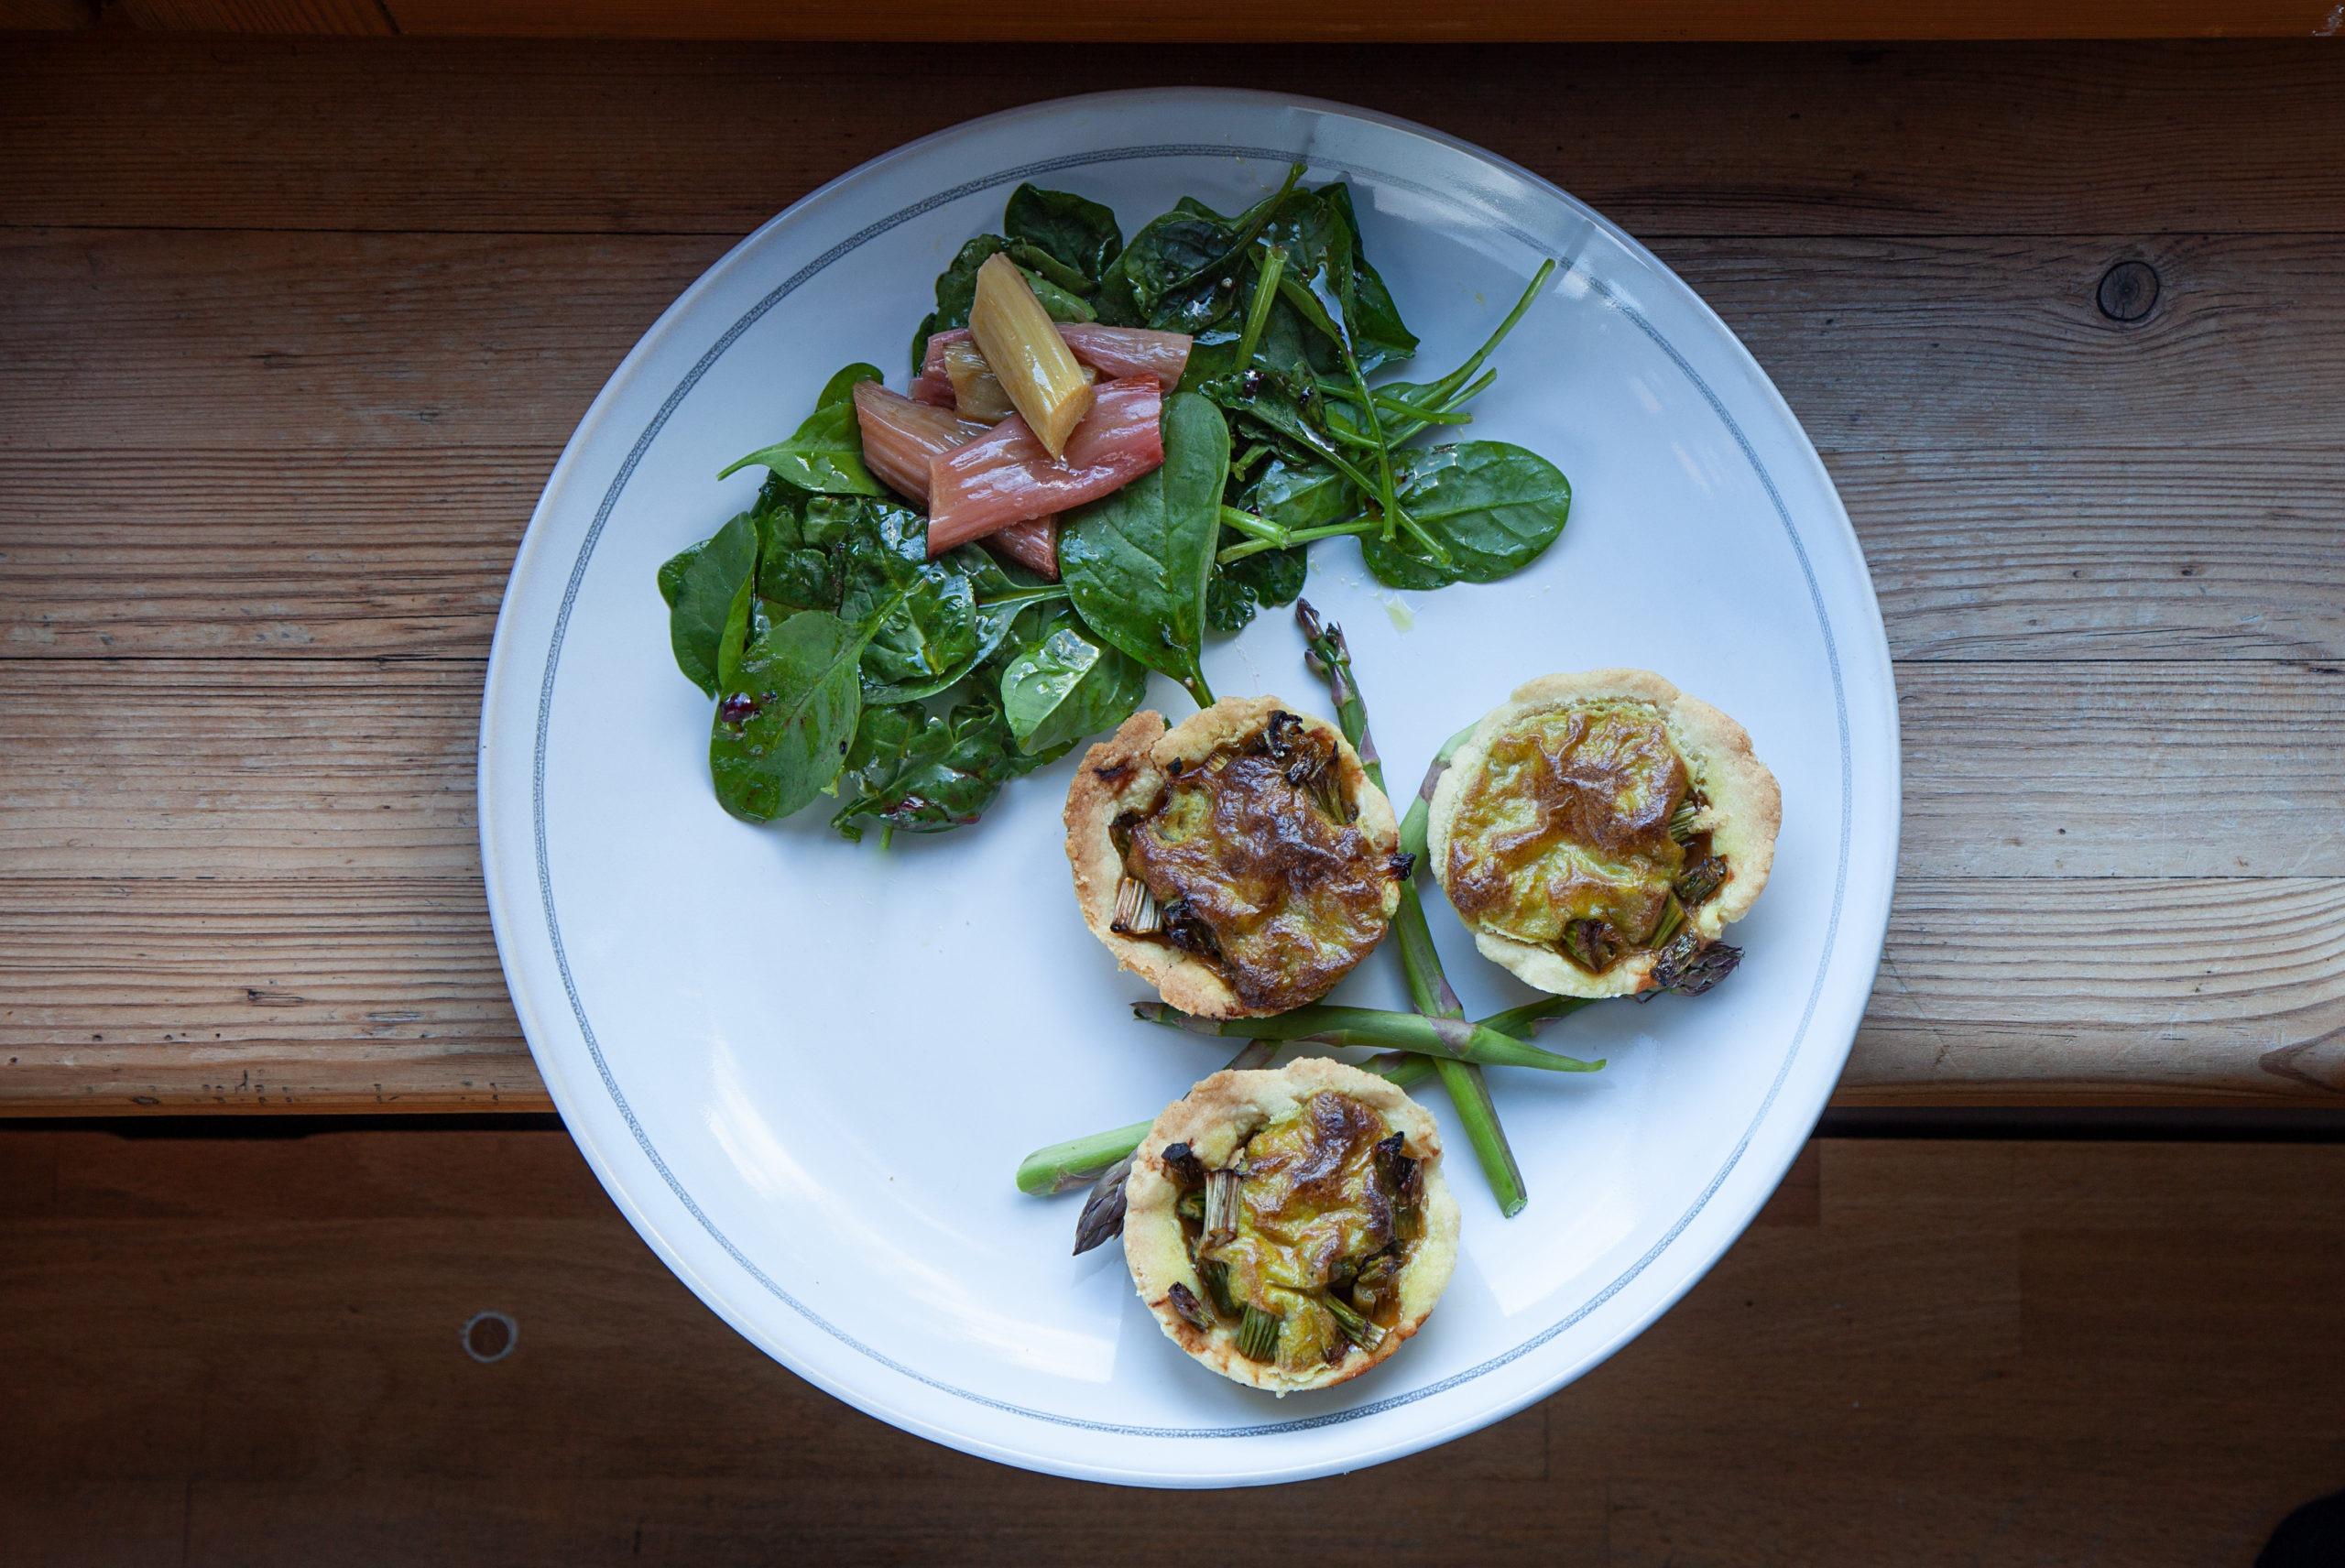 Veggie salad with Halloumi